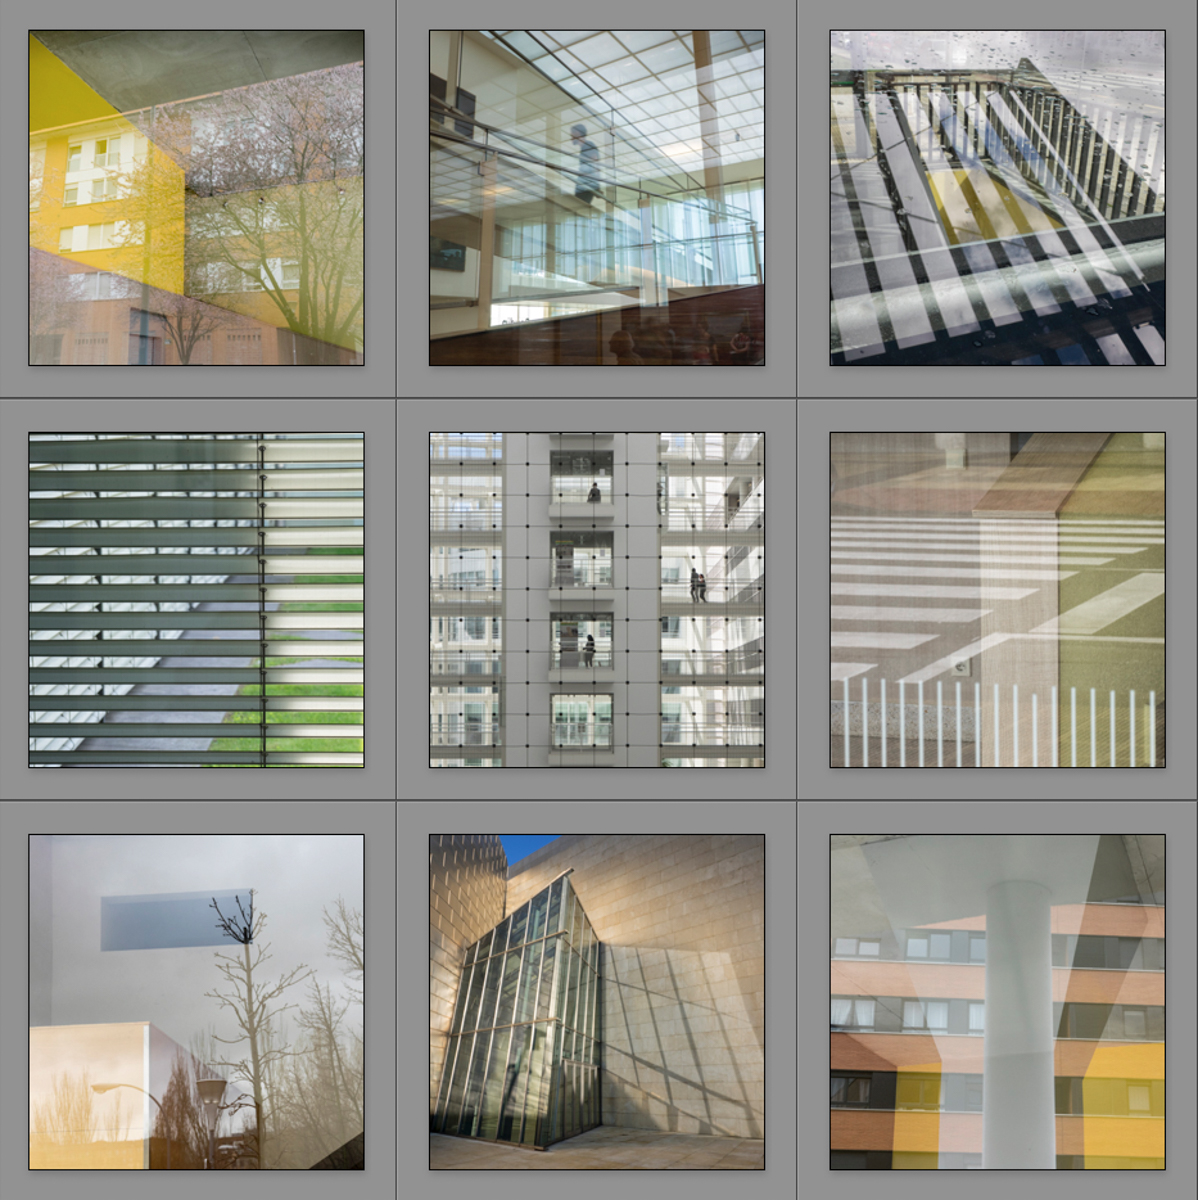 políptico 2 Heliografías - Mirrors and Windows - Mirrors and Windows 2018